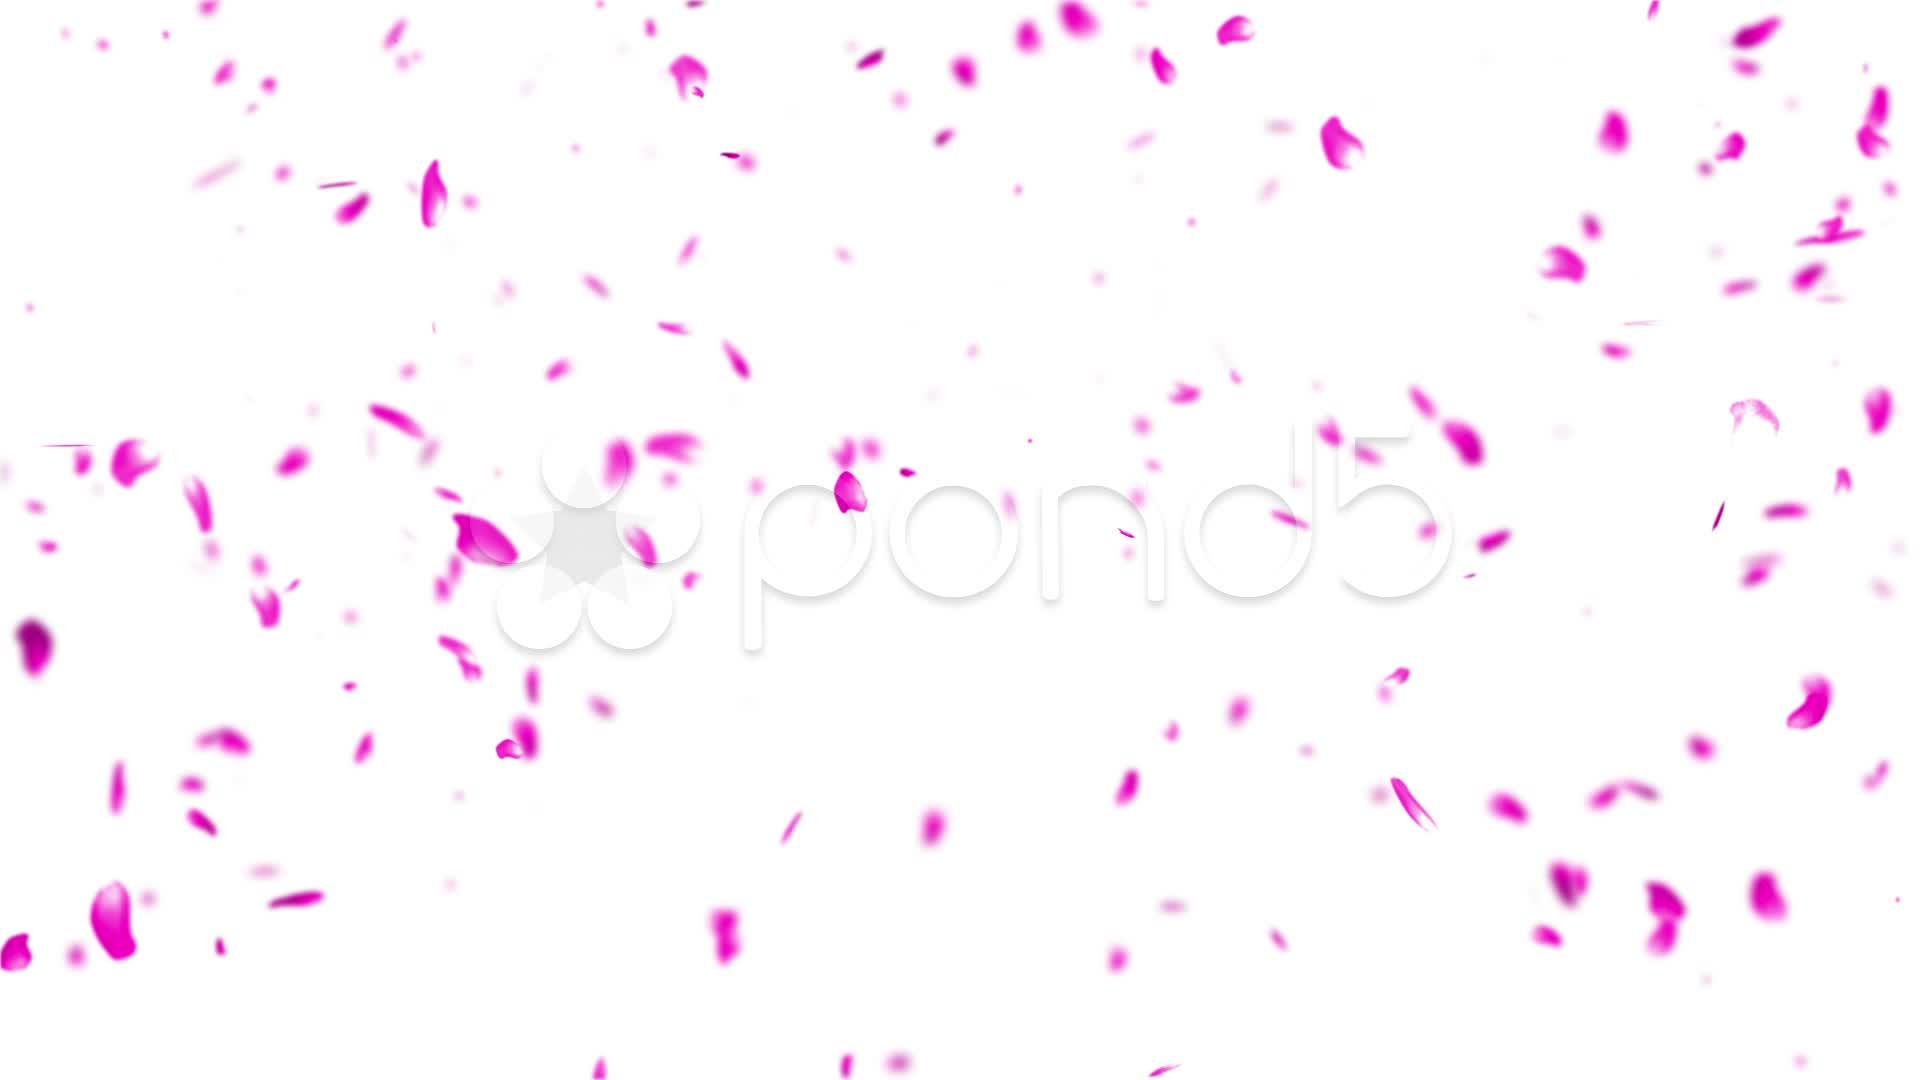 Animated 3d Wallpaper Gifs Looping Falling Sakura Petals Cherry Blossoms Dof Hi Res 21372761